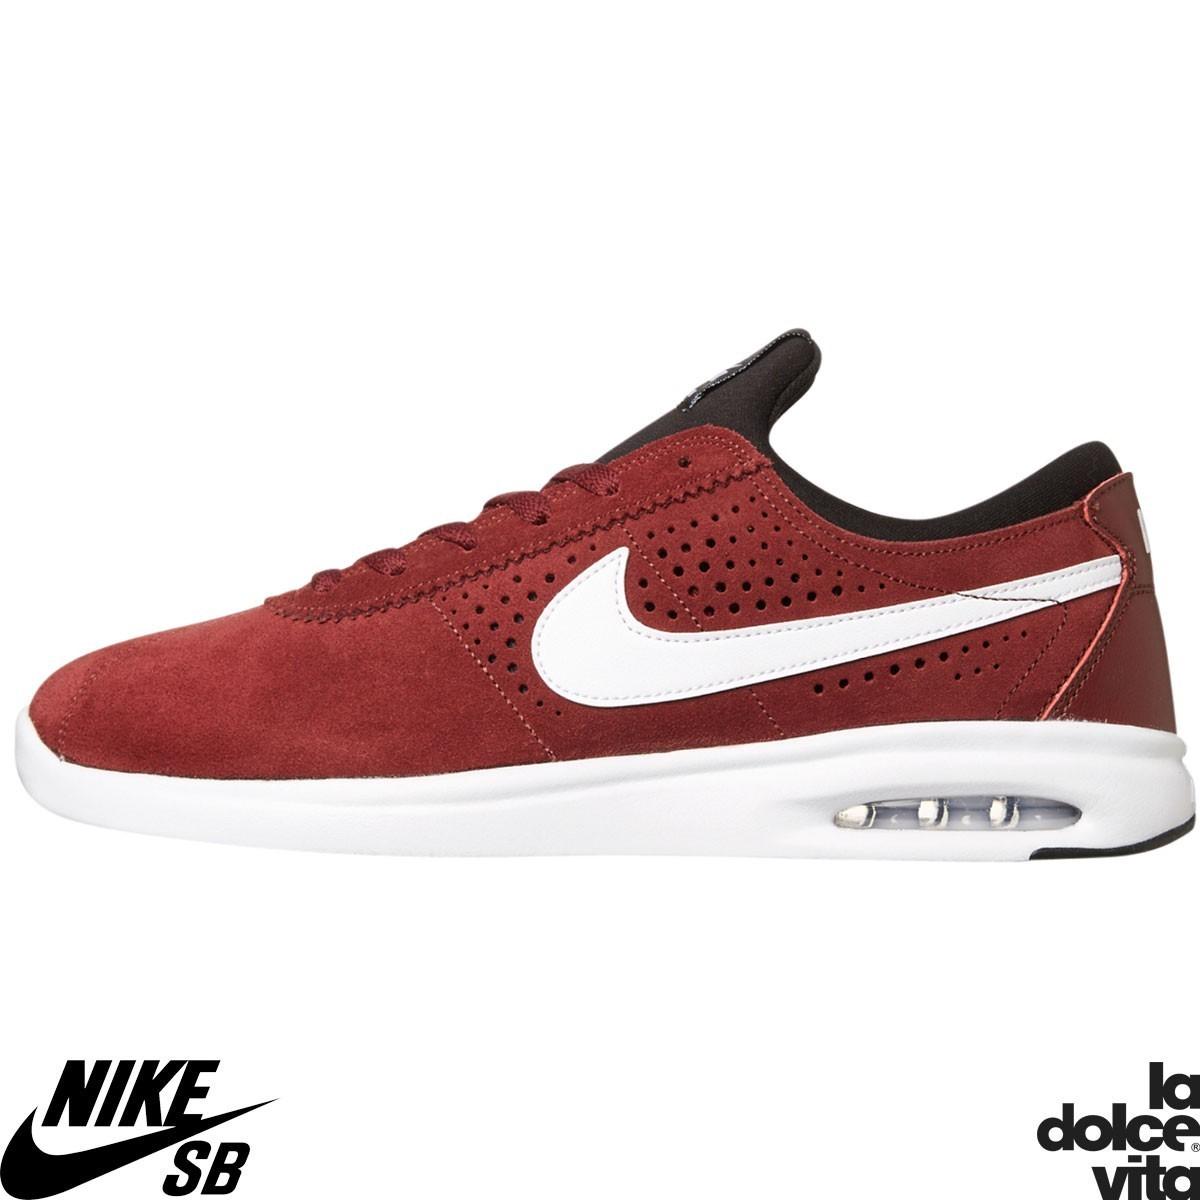 Nike SB vit